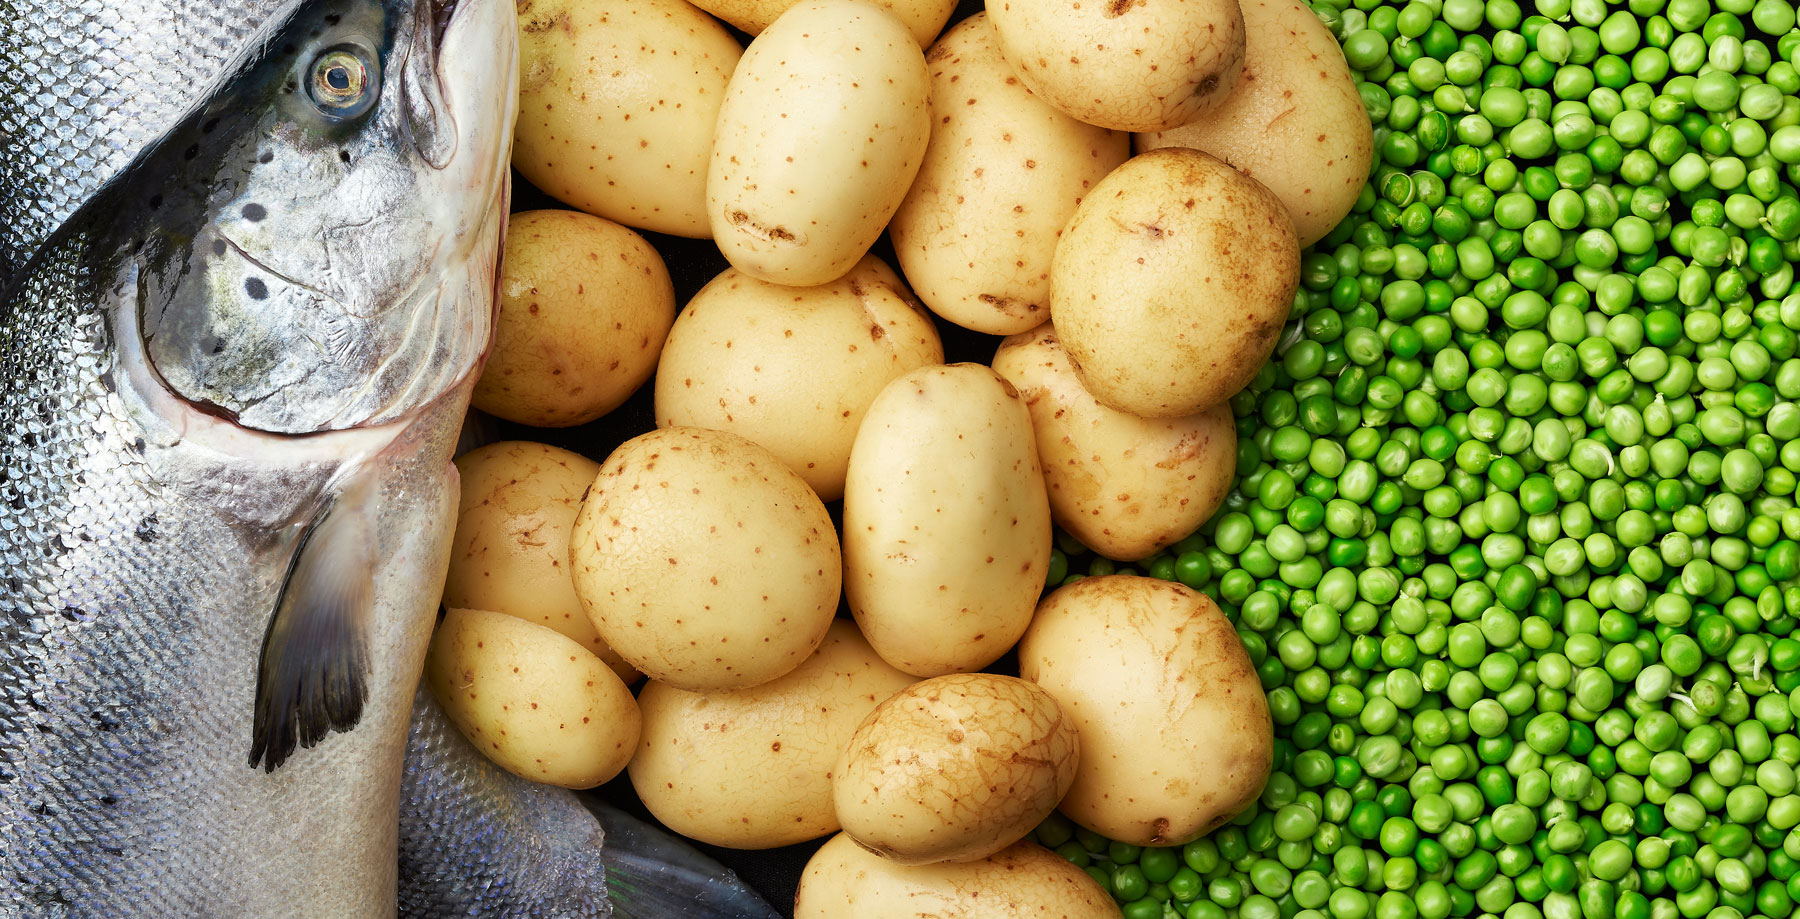 Salmon, potatoes and peas